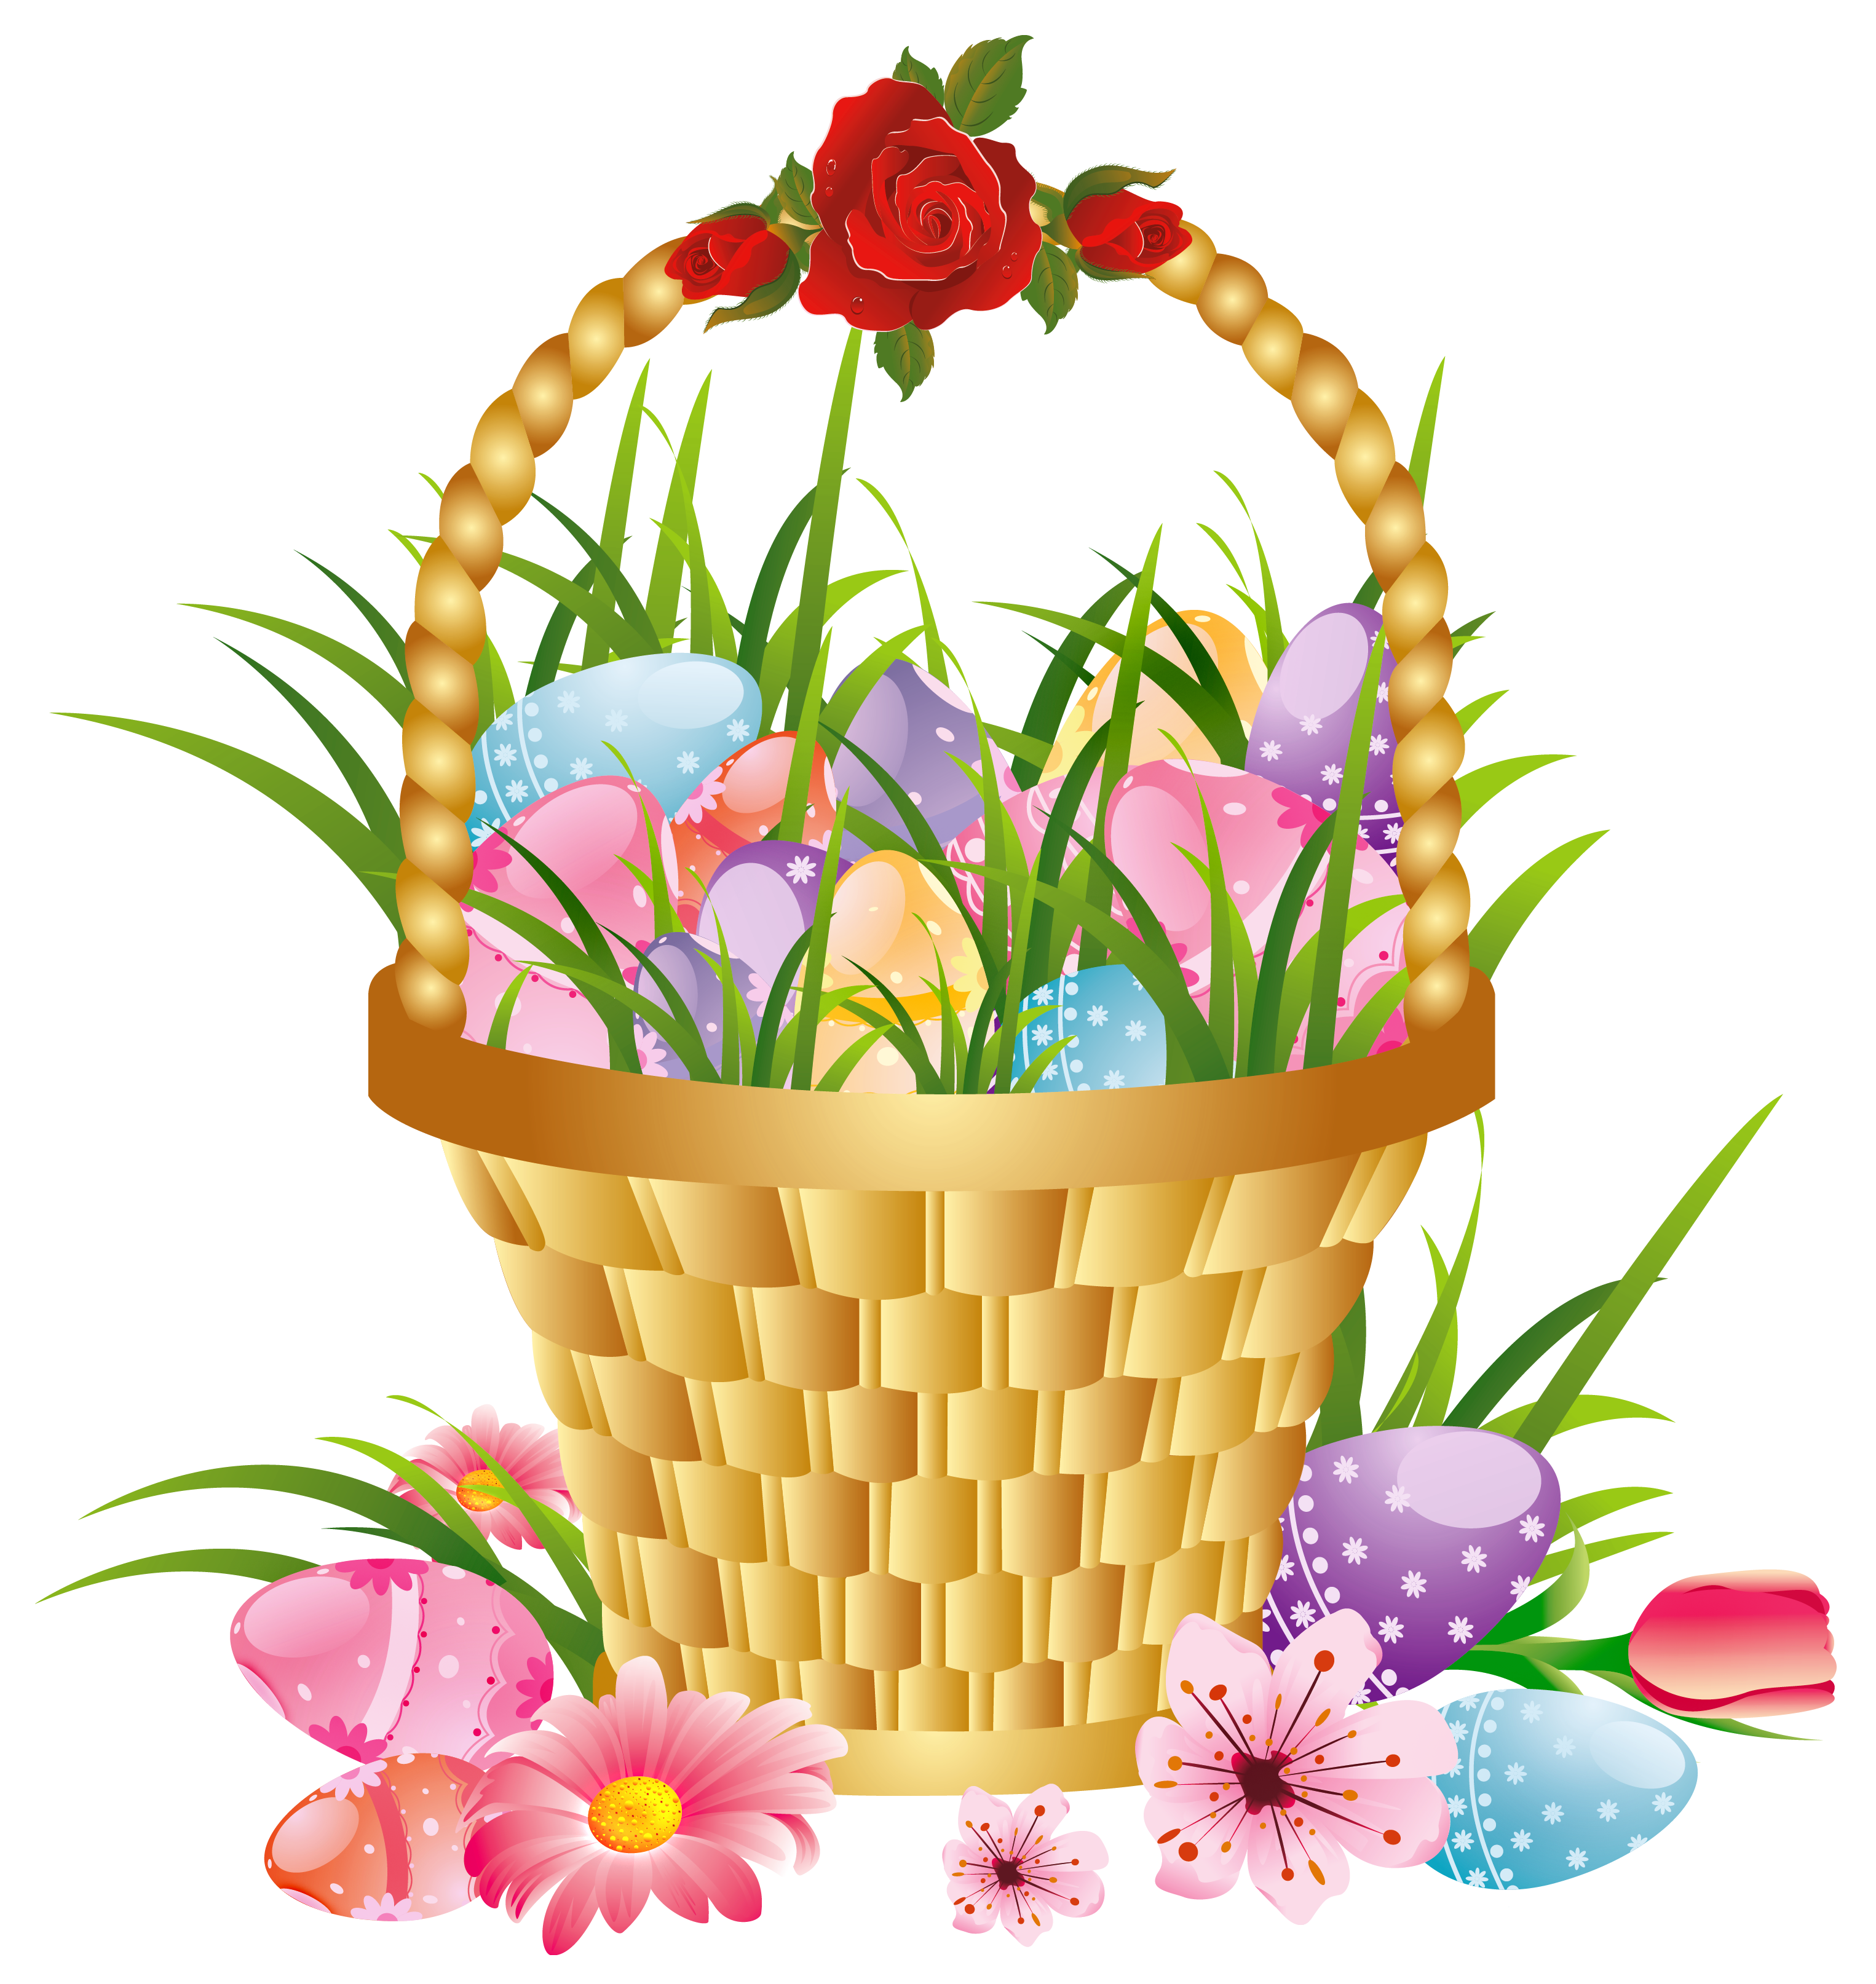 Gift Basket PNG HD - 125741